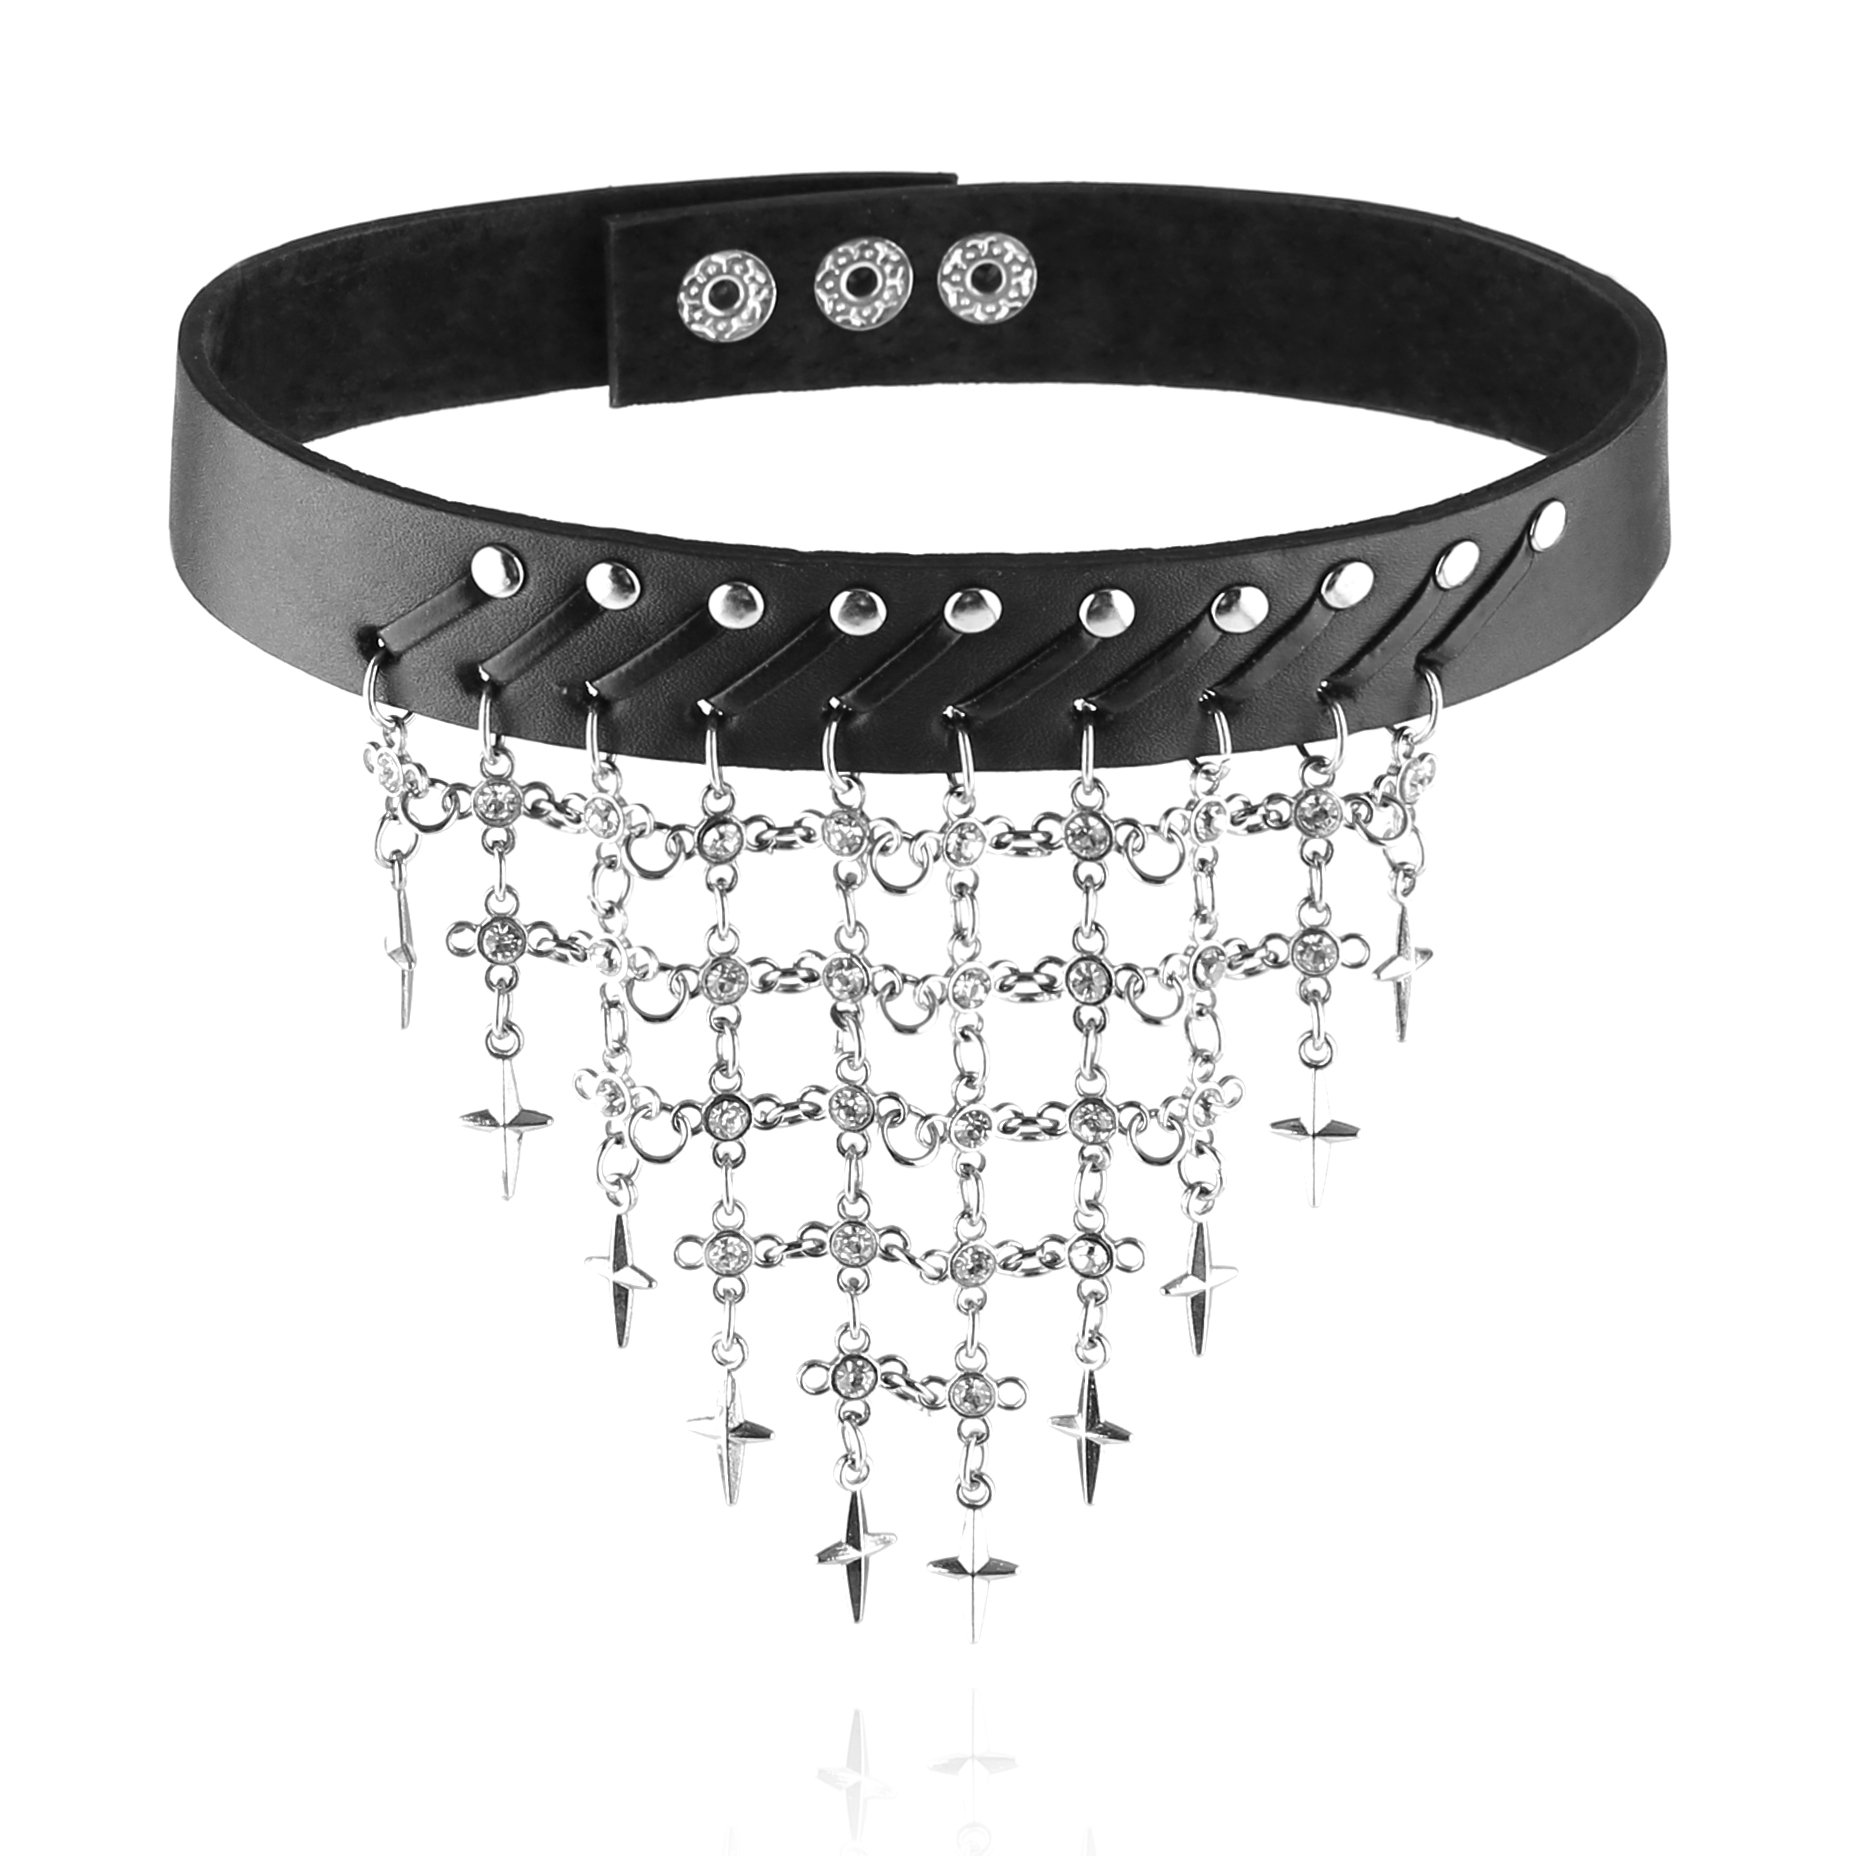 HZMAN Fashion Women Cool Punk Goth CZ Metal Flash swing Link Leather Collar Choker Necklace (Black)